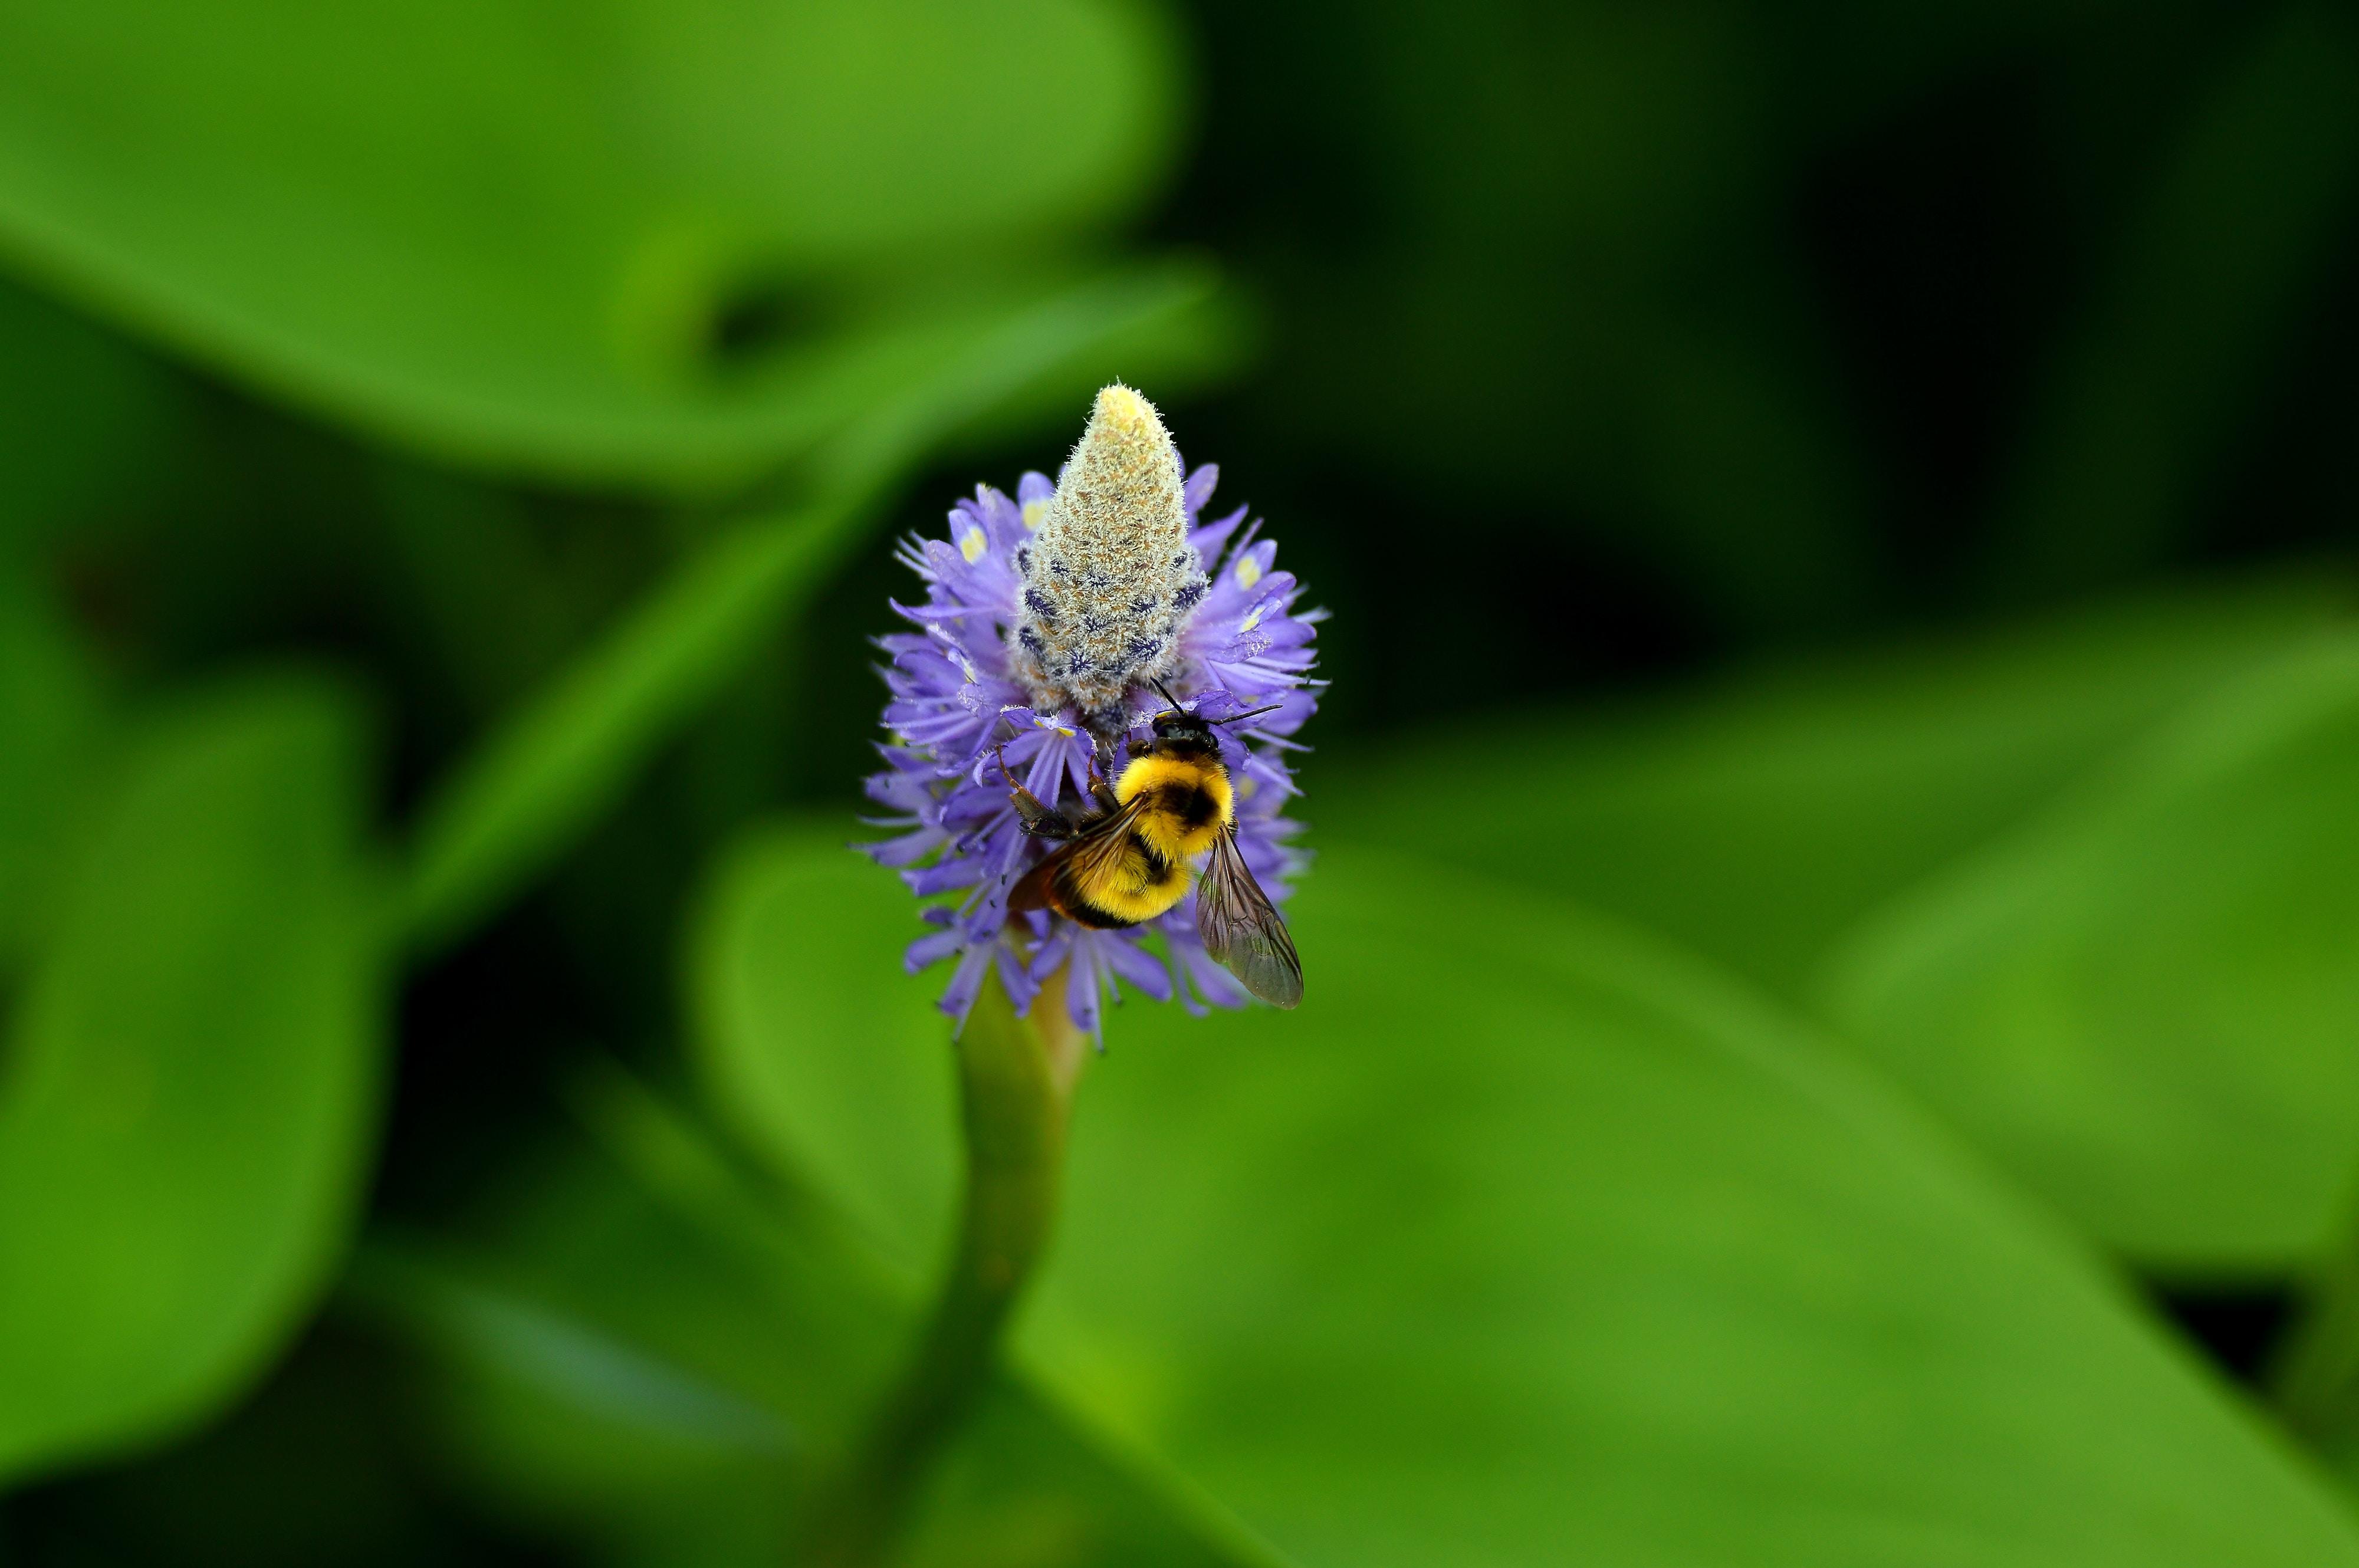 Bee pollinates a purple flower near leaves